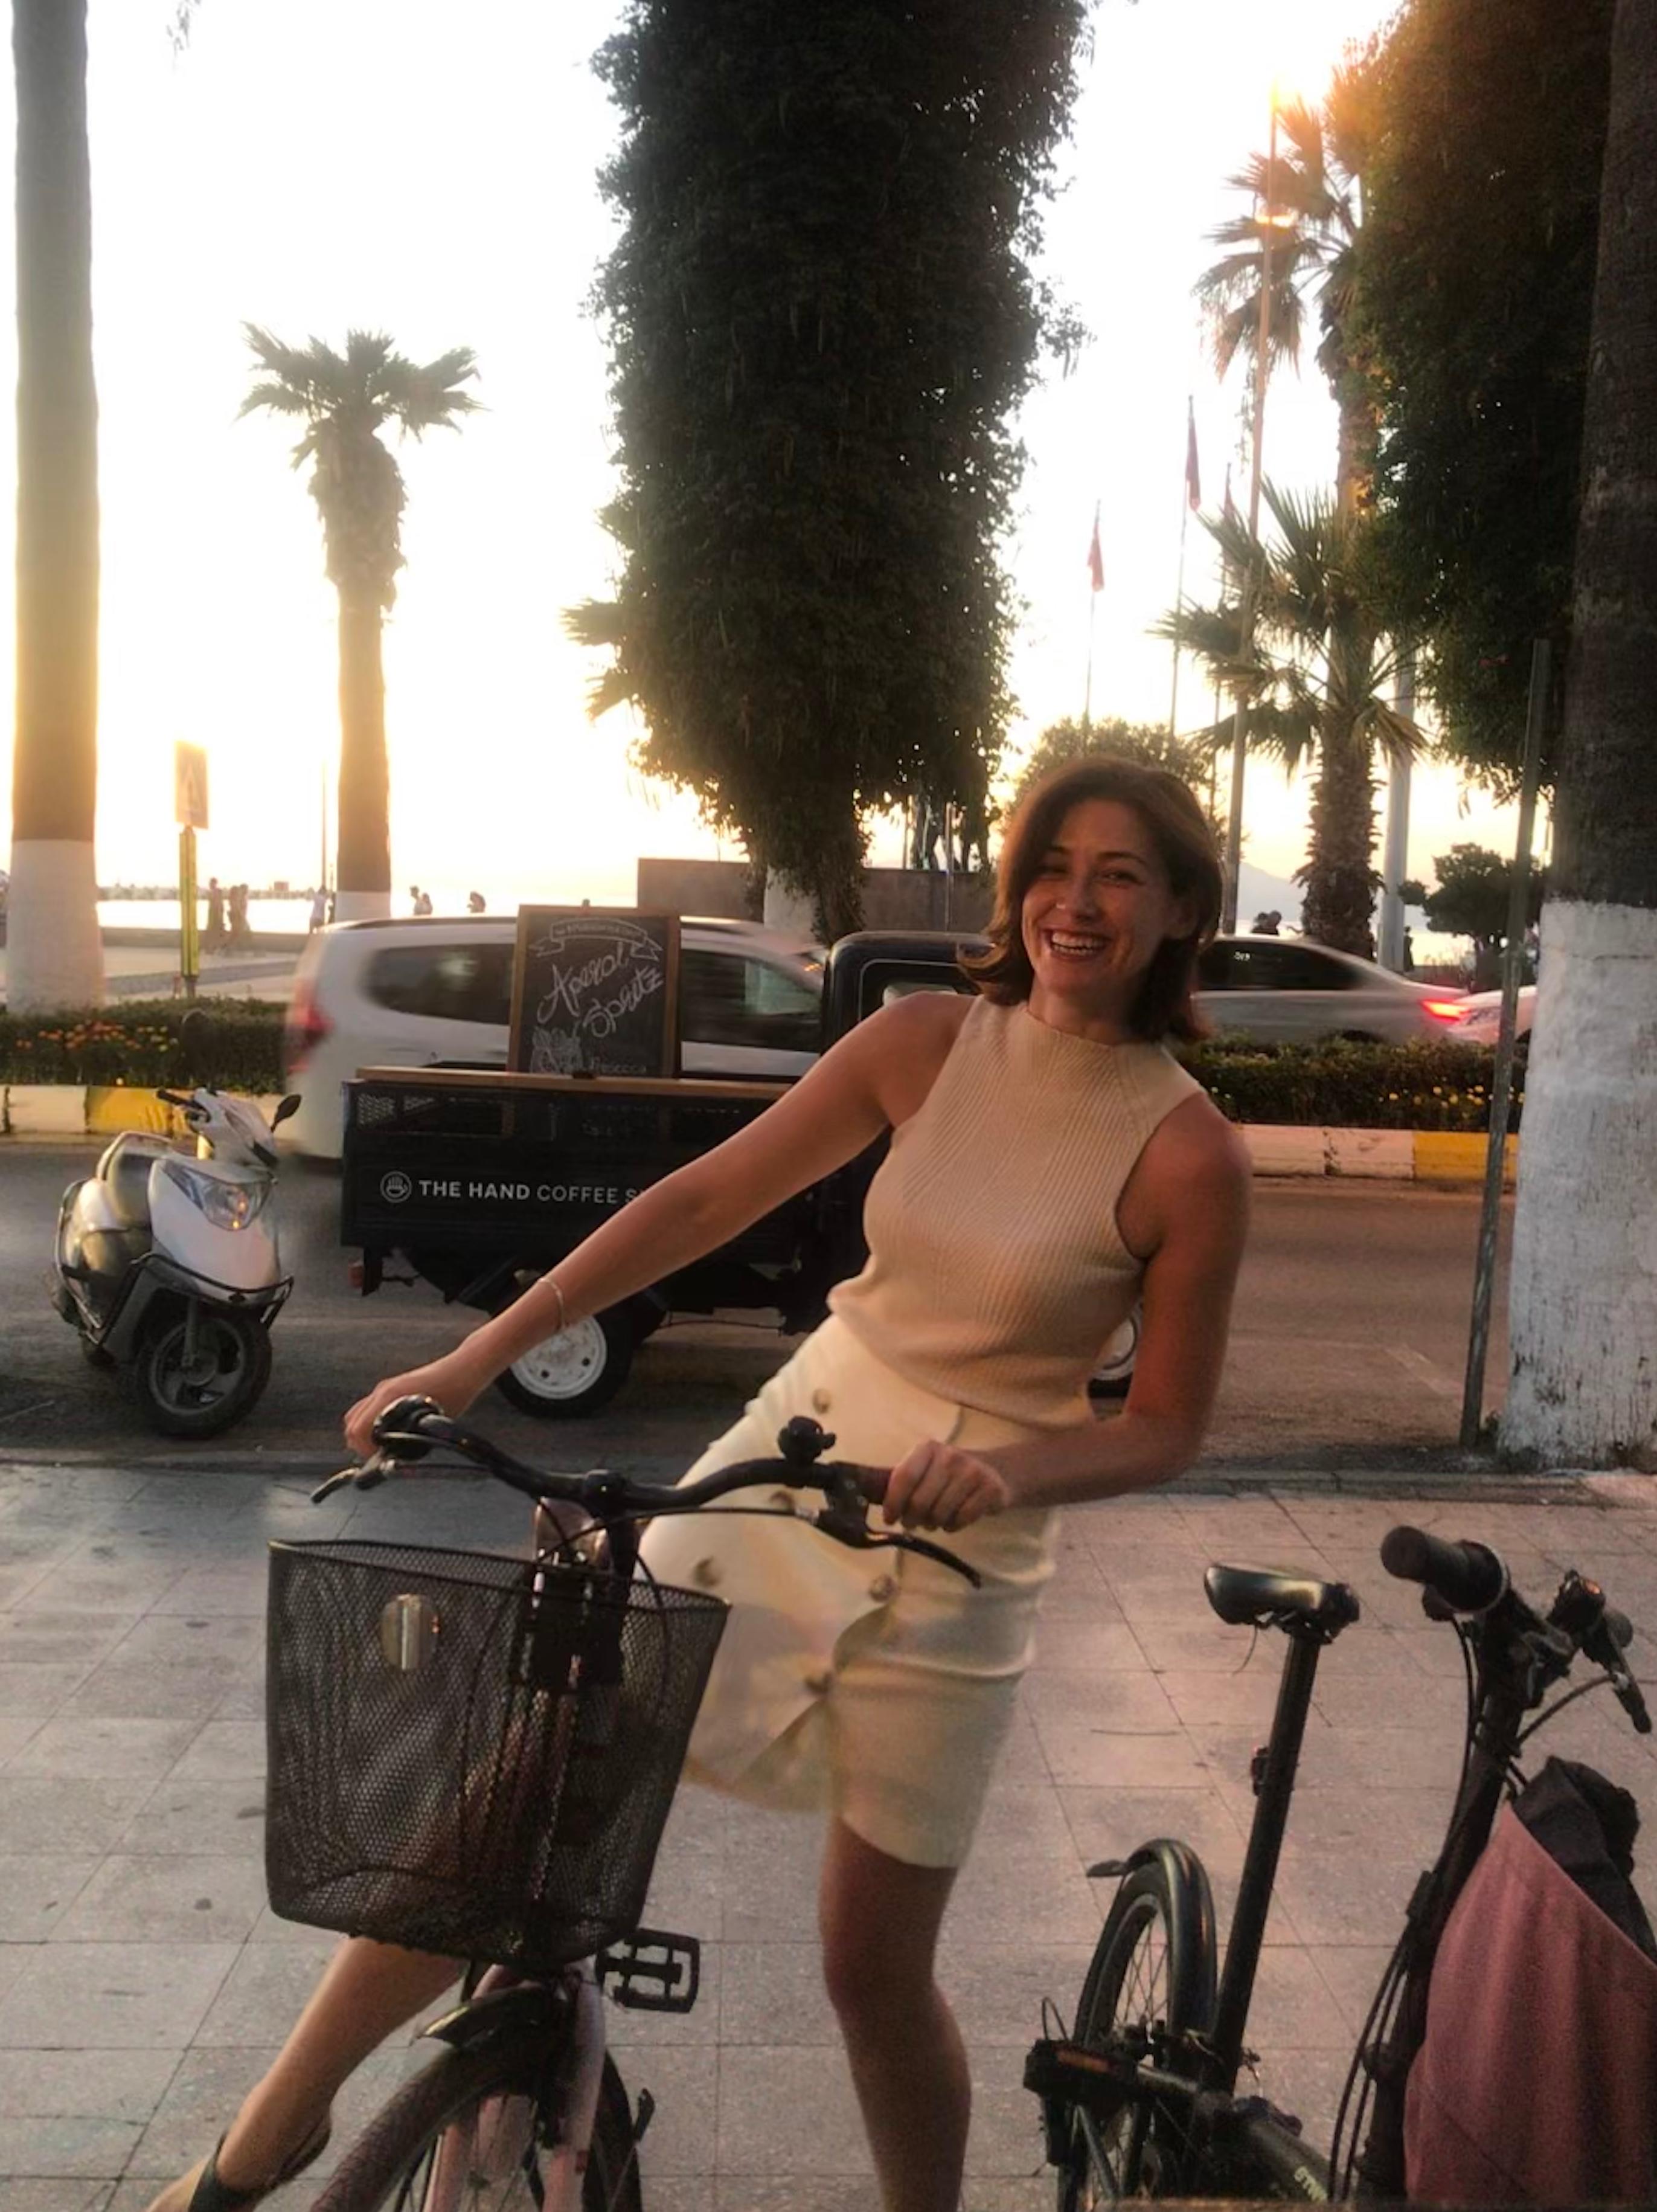 Sabel Yilmaz's profile image